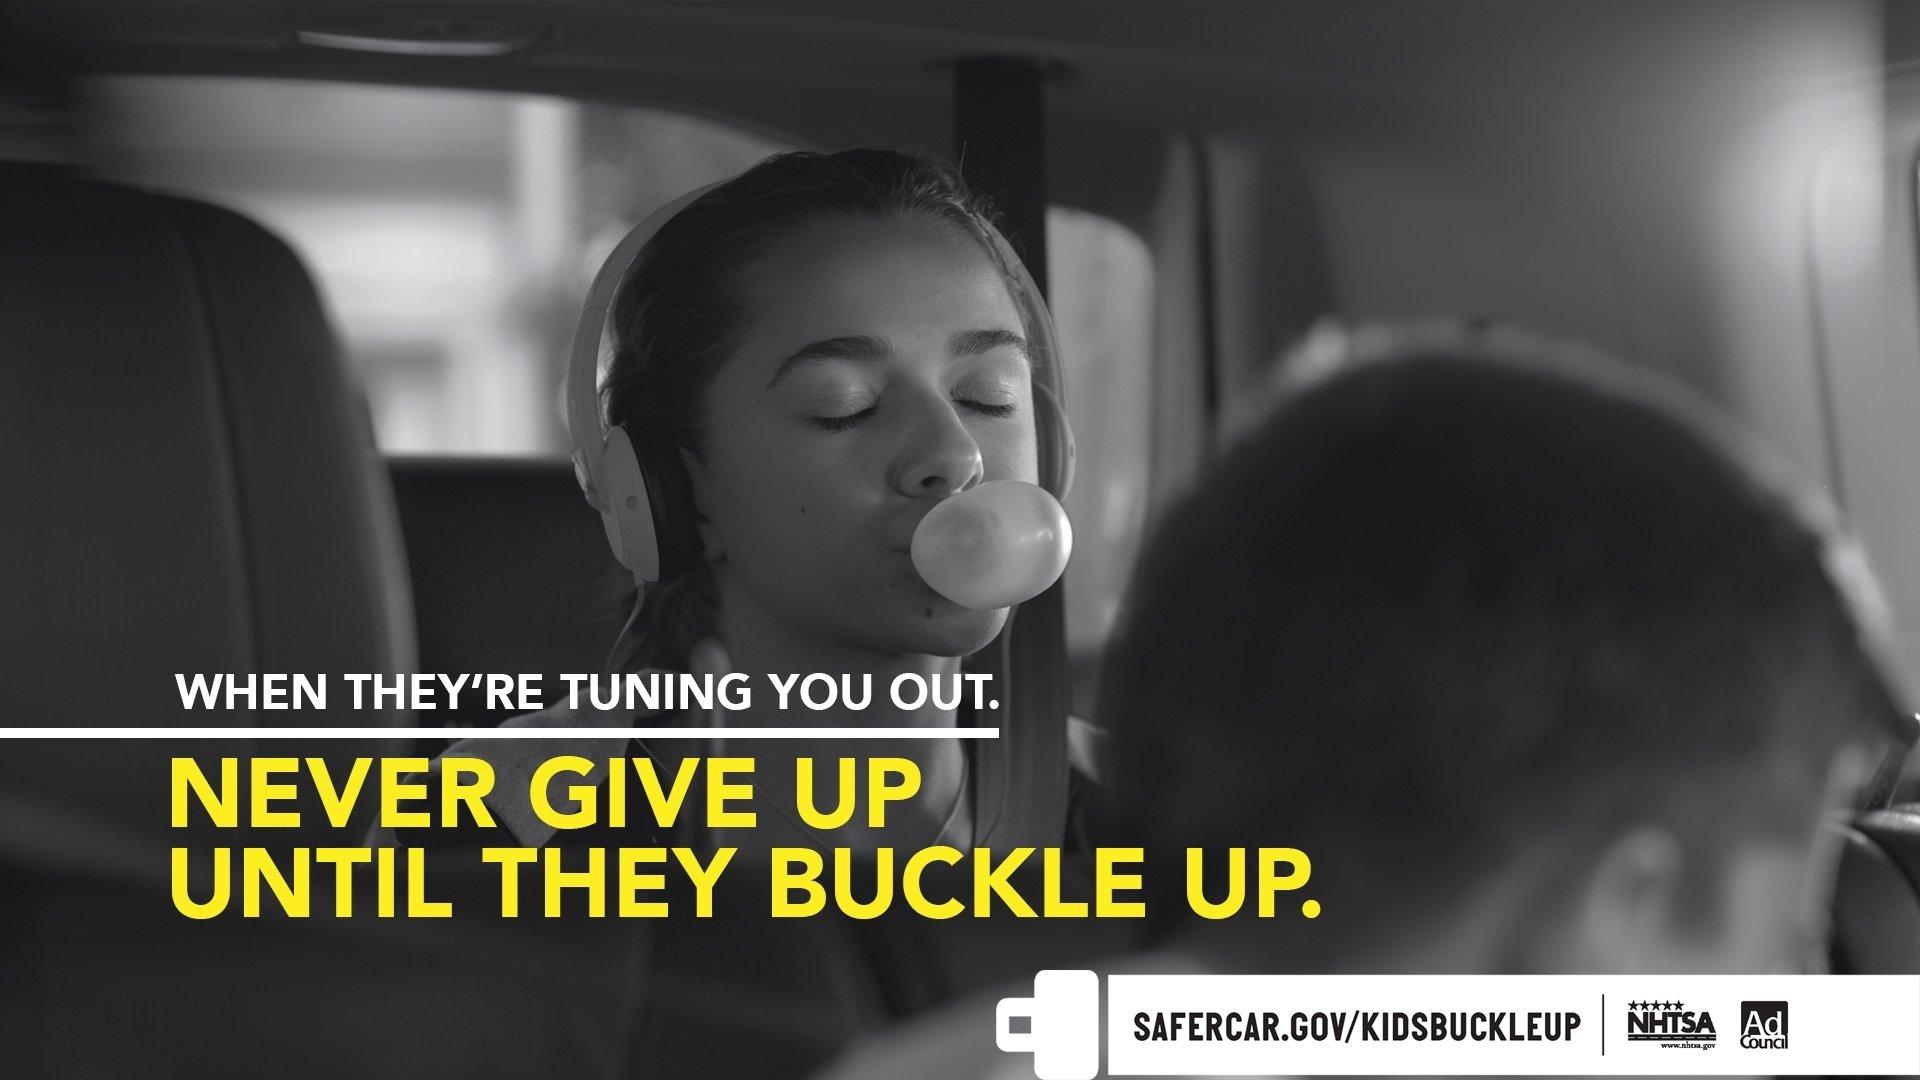 10 Attractive Funny Public Service Announcement Ideas psa central seat belt safety 2020